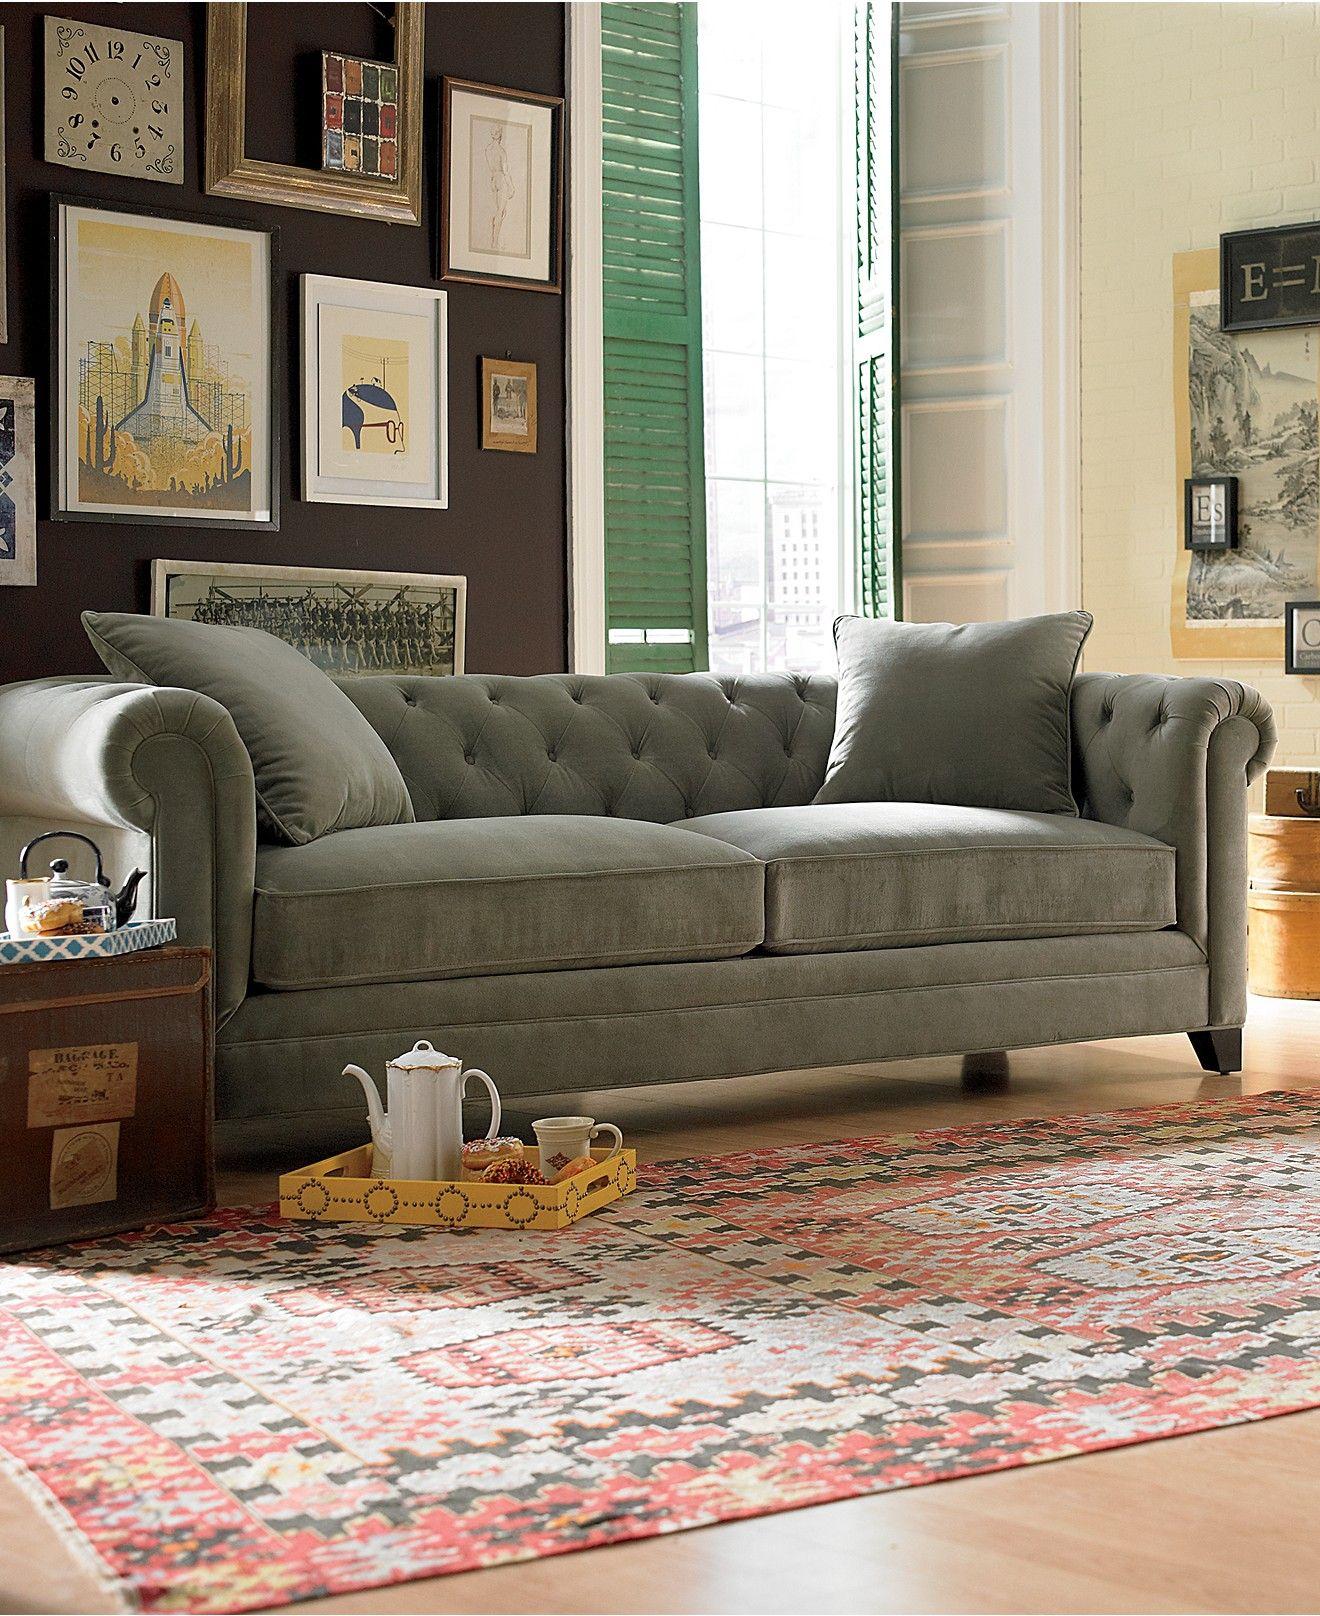 Martha Stewart Collection Saybridge Living Room Furniture Collection